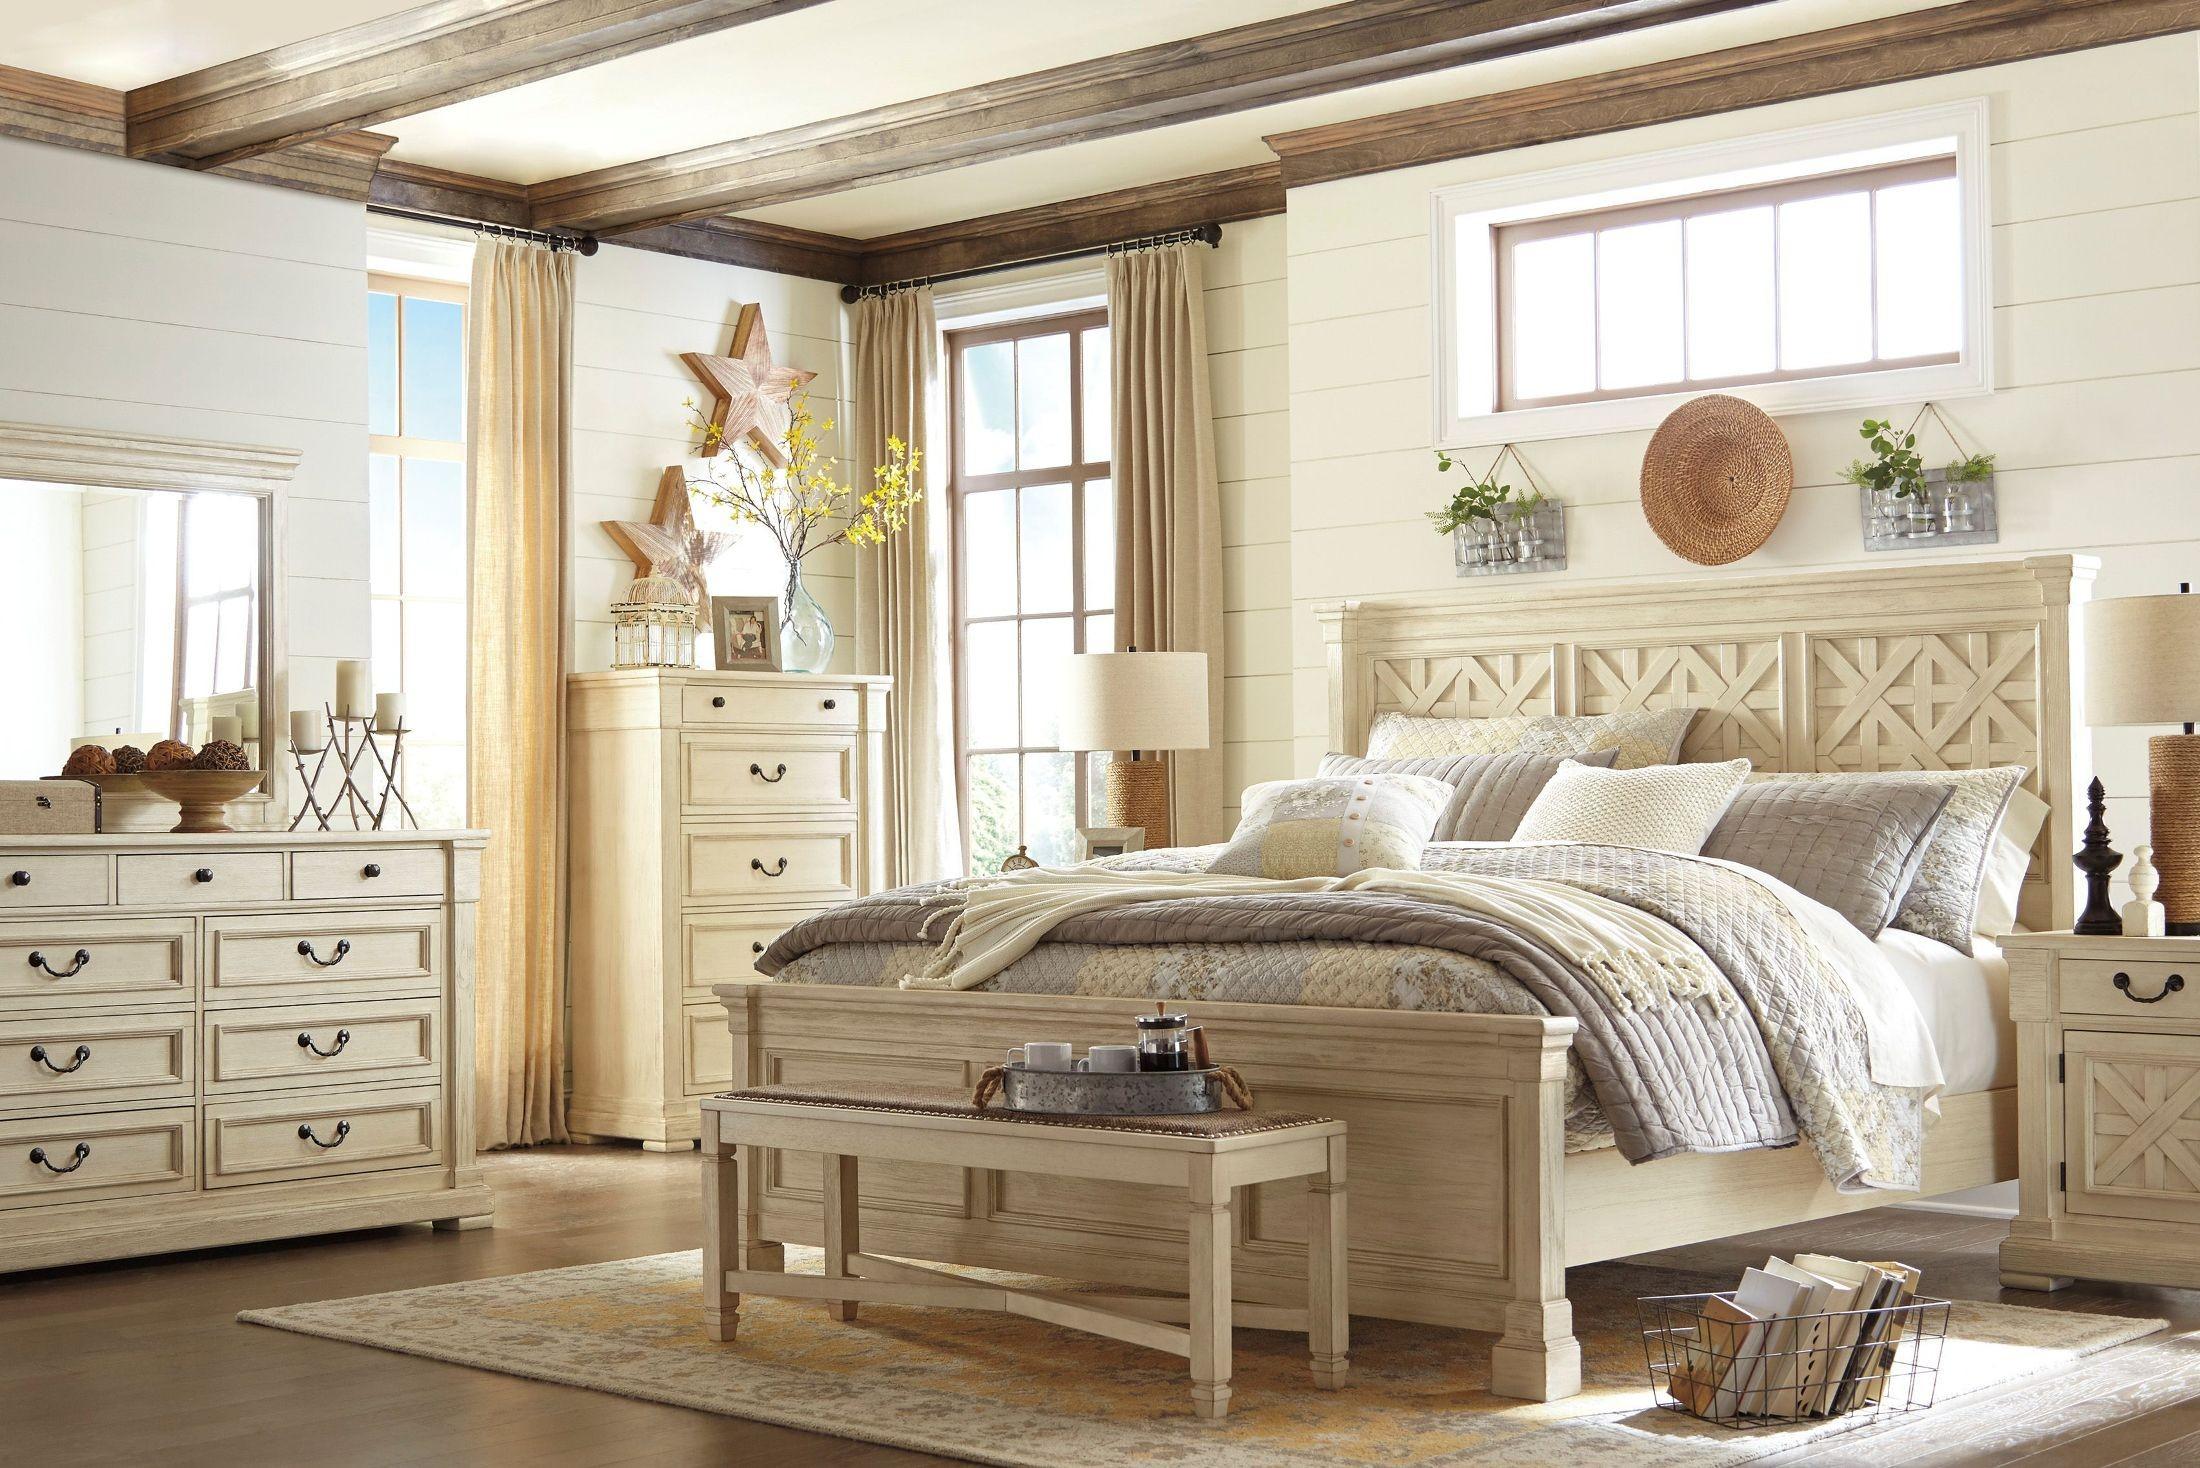 Bolanburg White Panel Bedroom Set from Ashley  Coleman